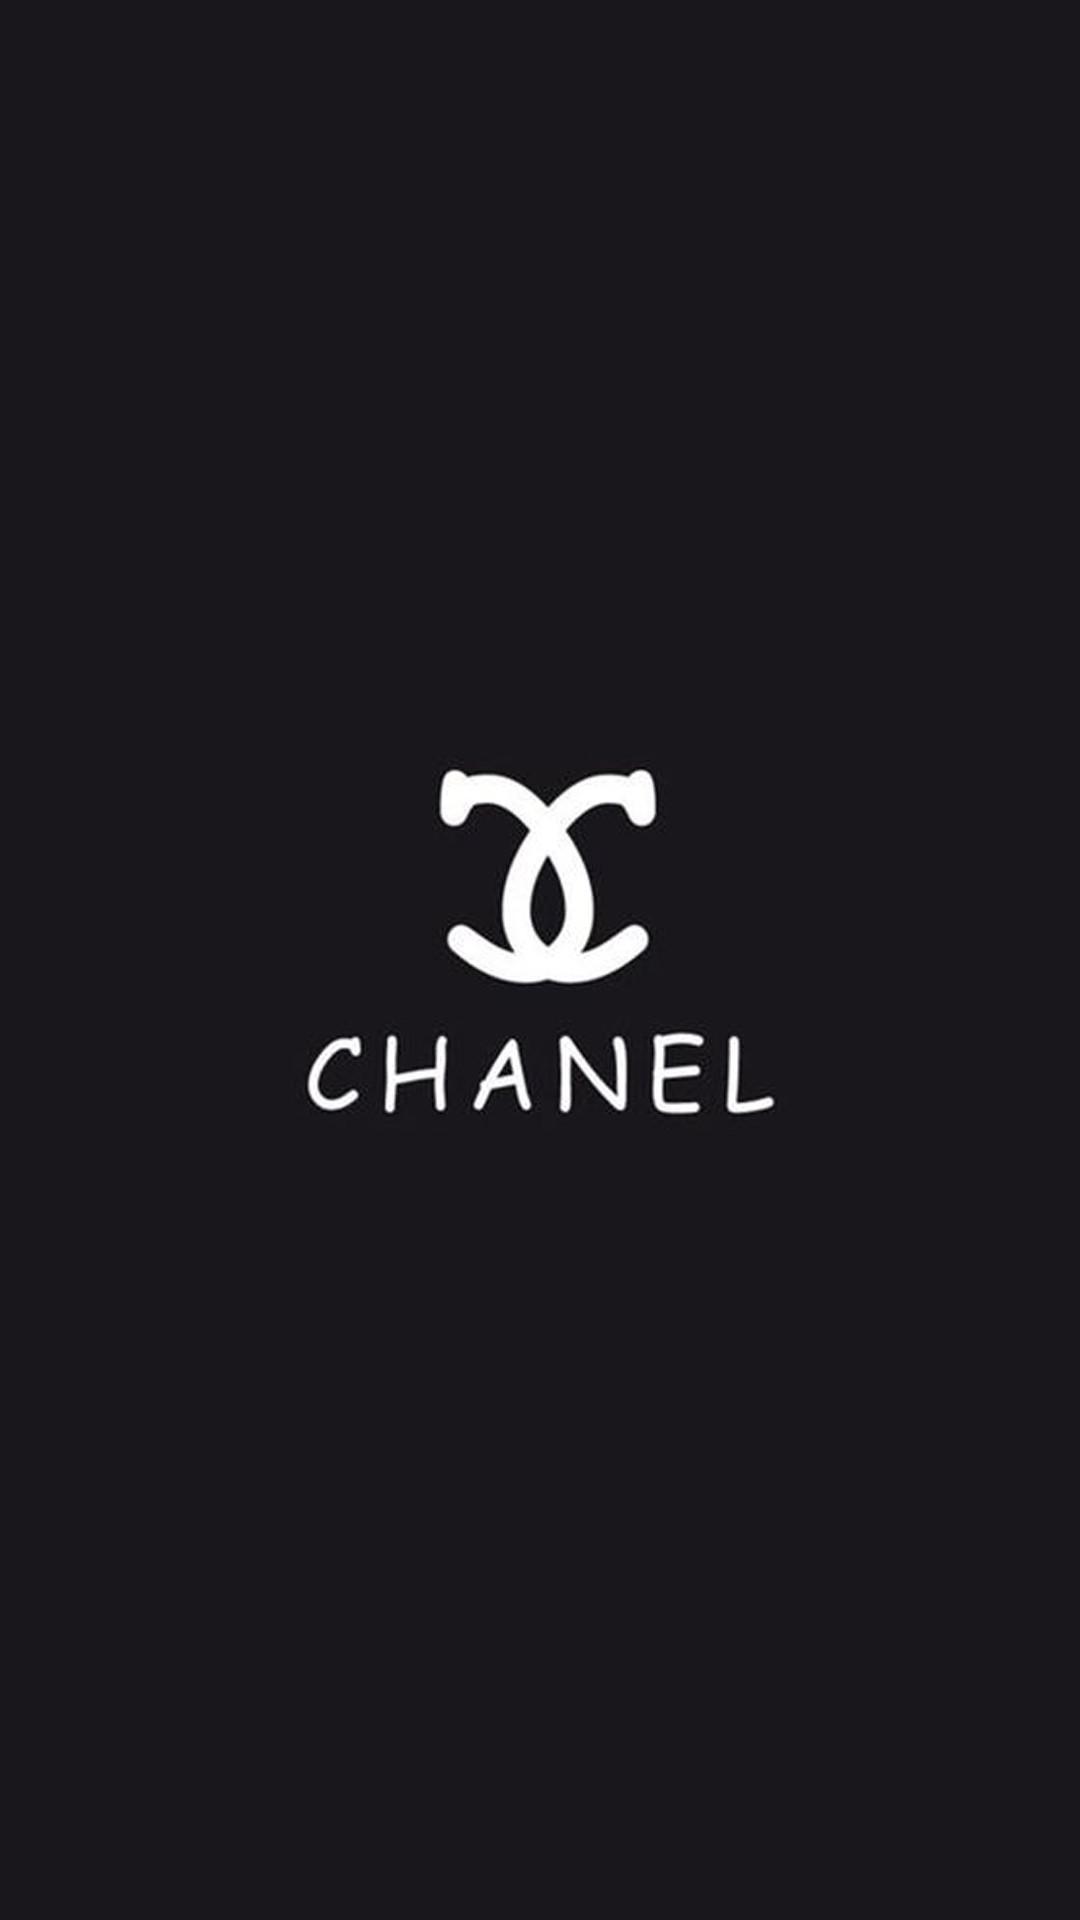 Chanel Logo Wallpaper 65 Images